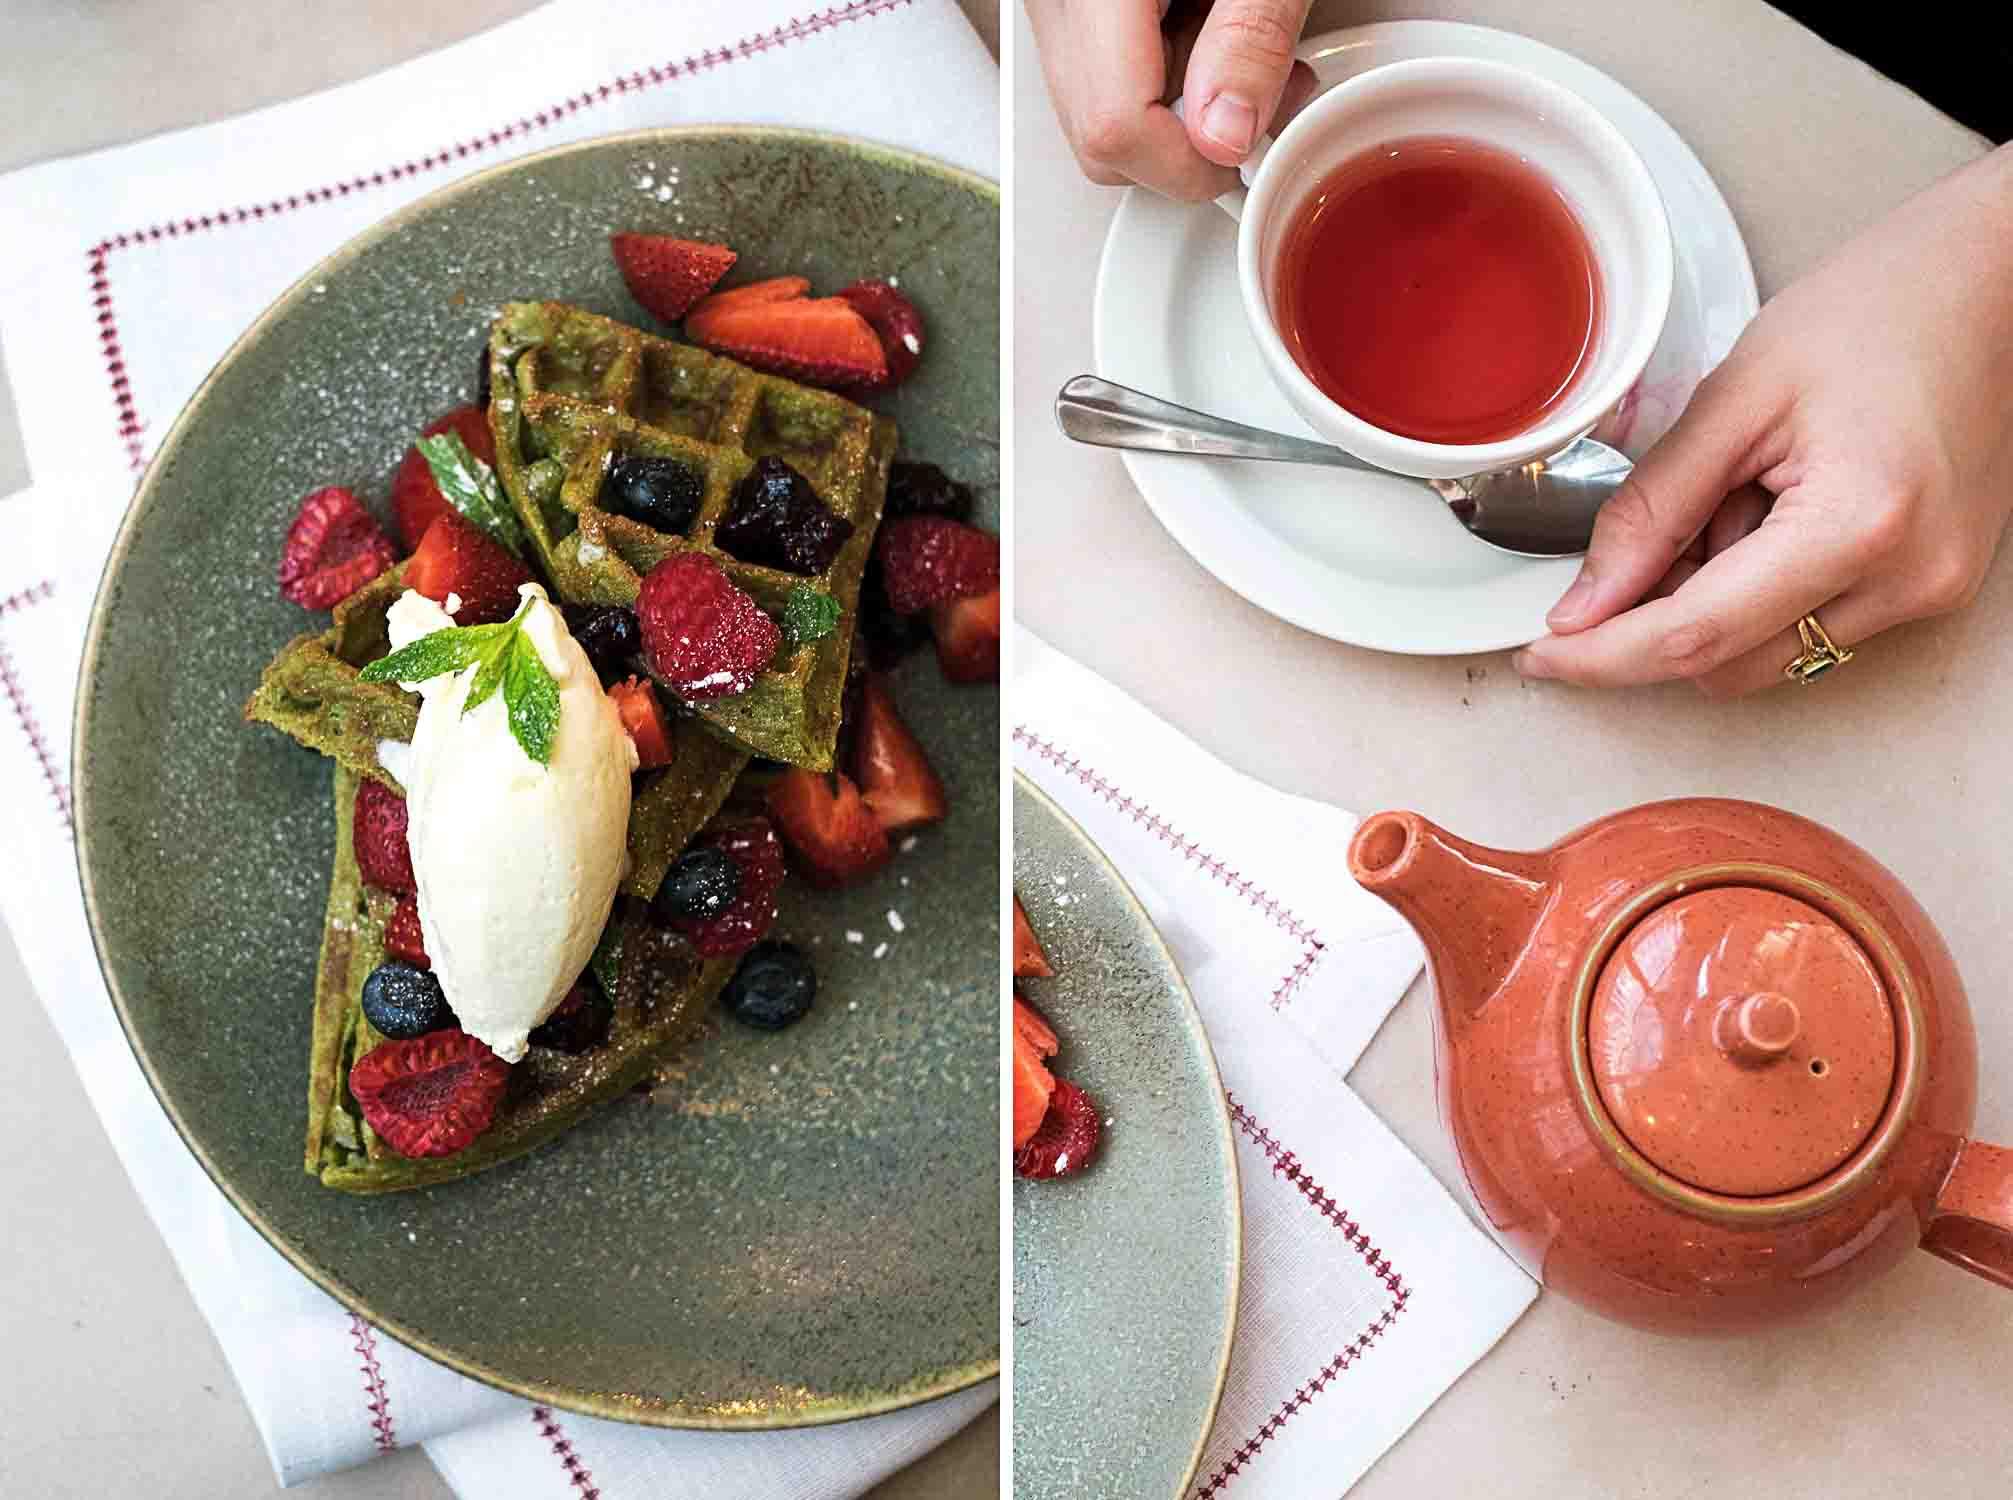 Brunch at Rail House Café in Nova, Victoria - Green Tea Belgian Waffles